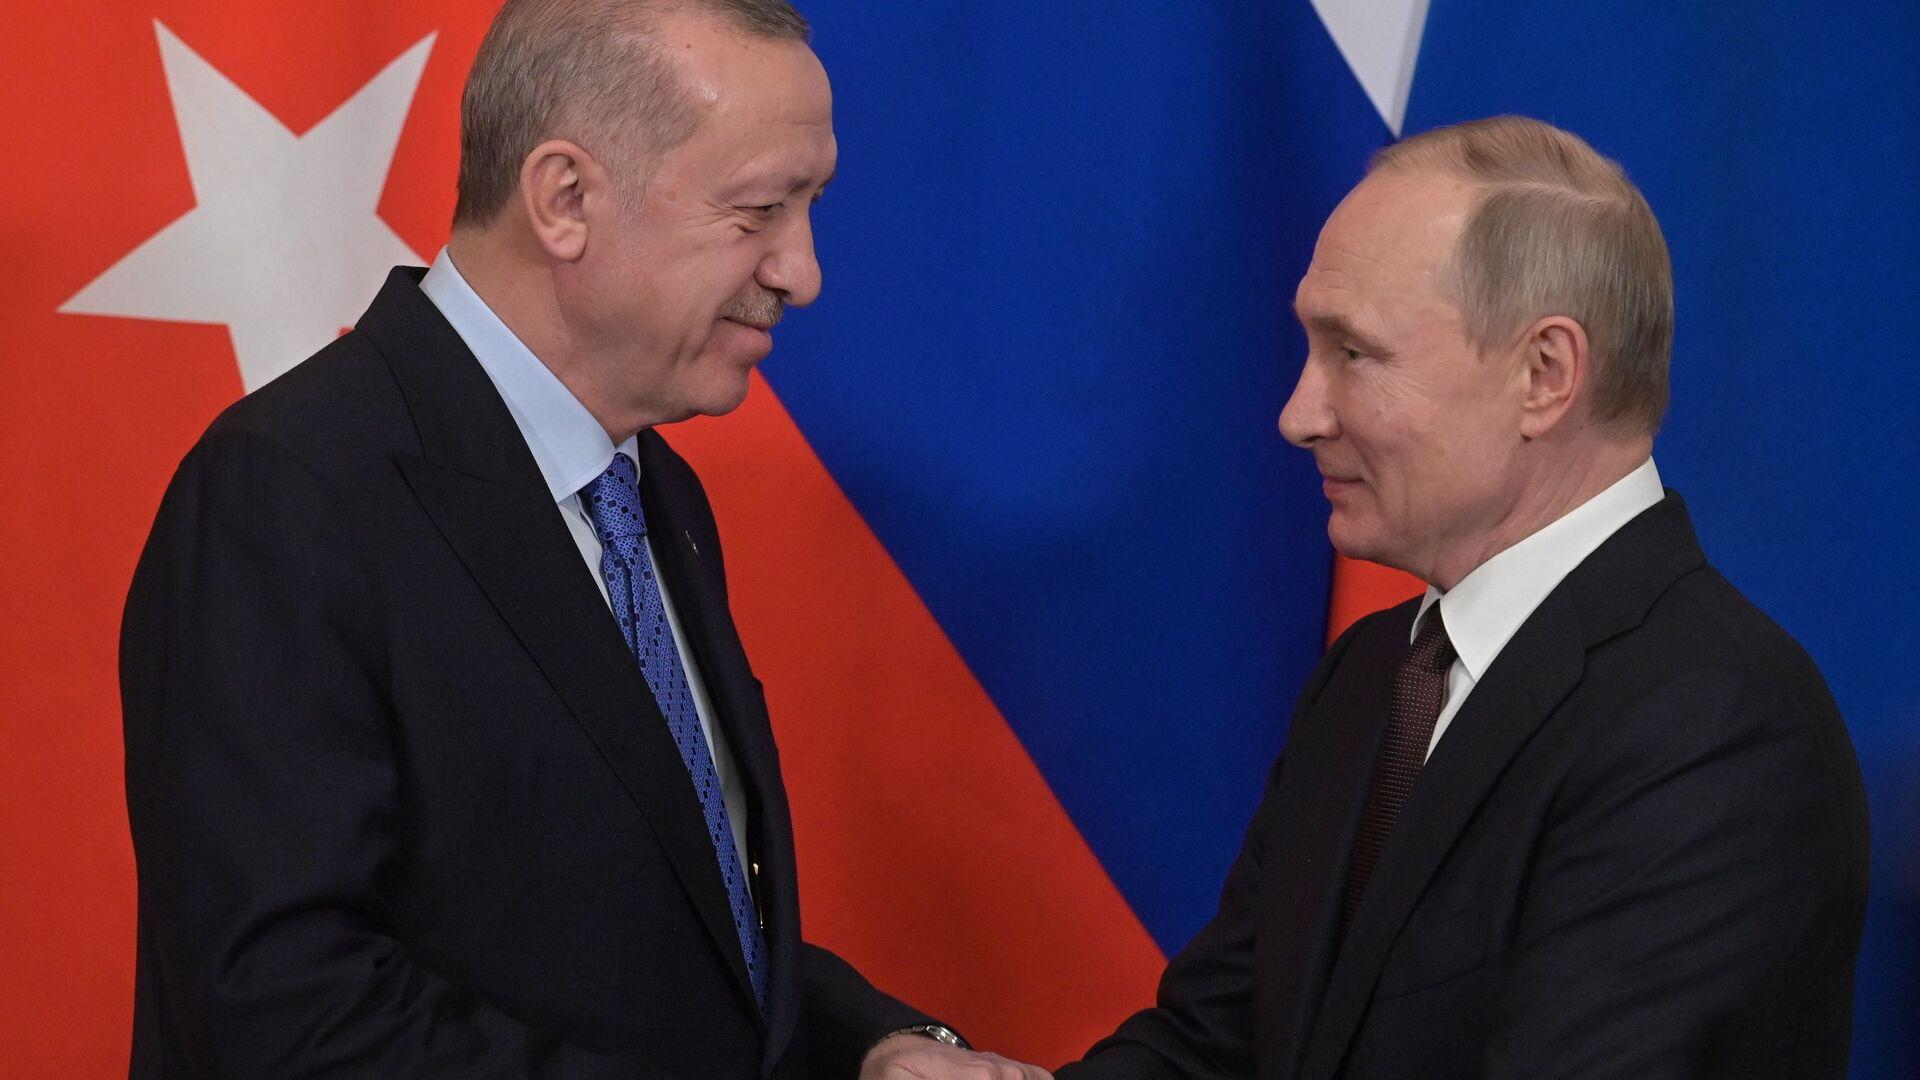 L'incontro tra Putin ed Erdogan a Mosca - Sputnik Italia, 1920, 30.09.2021